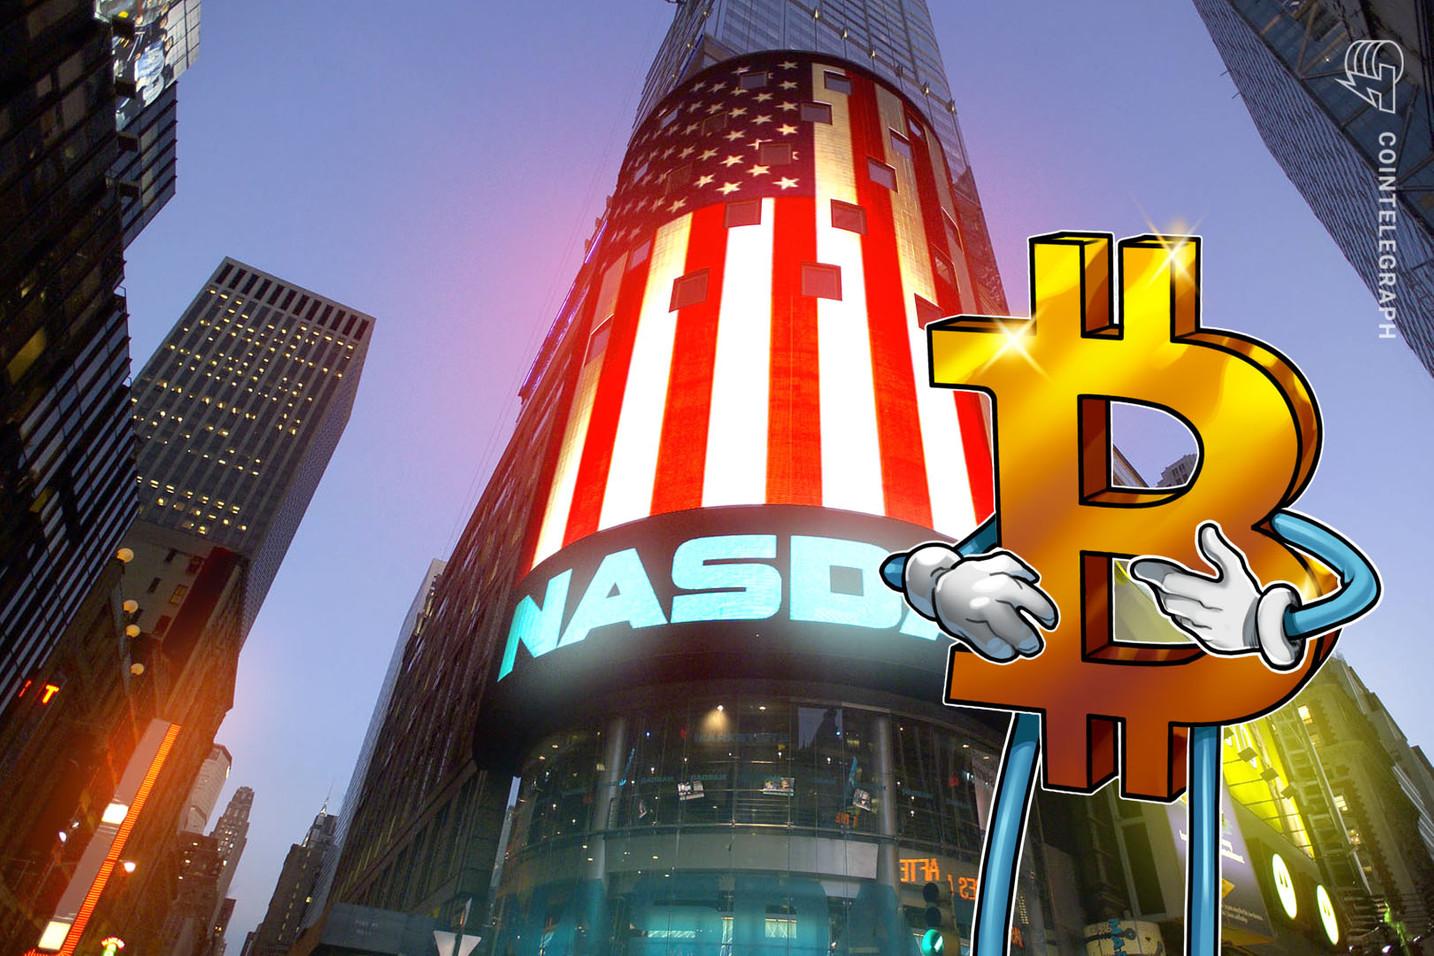 Bitcoin Rally in Danger? Wall Street Veterans Warn of Nasdaq Bubble